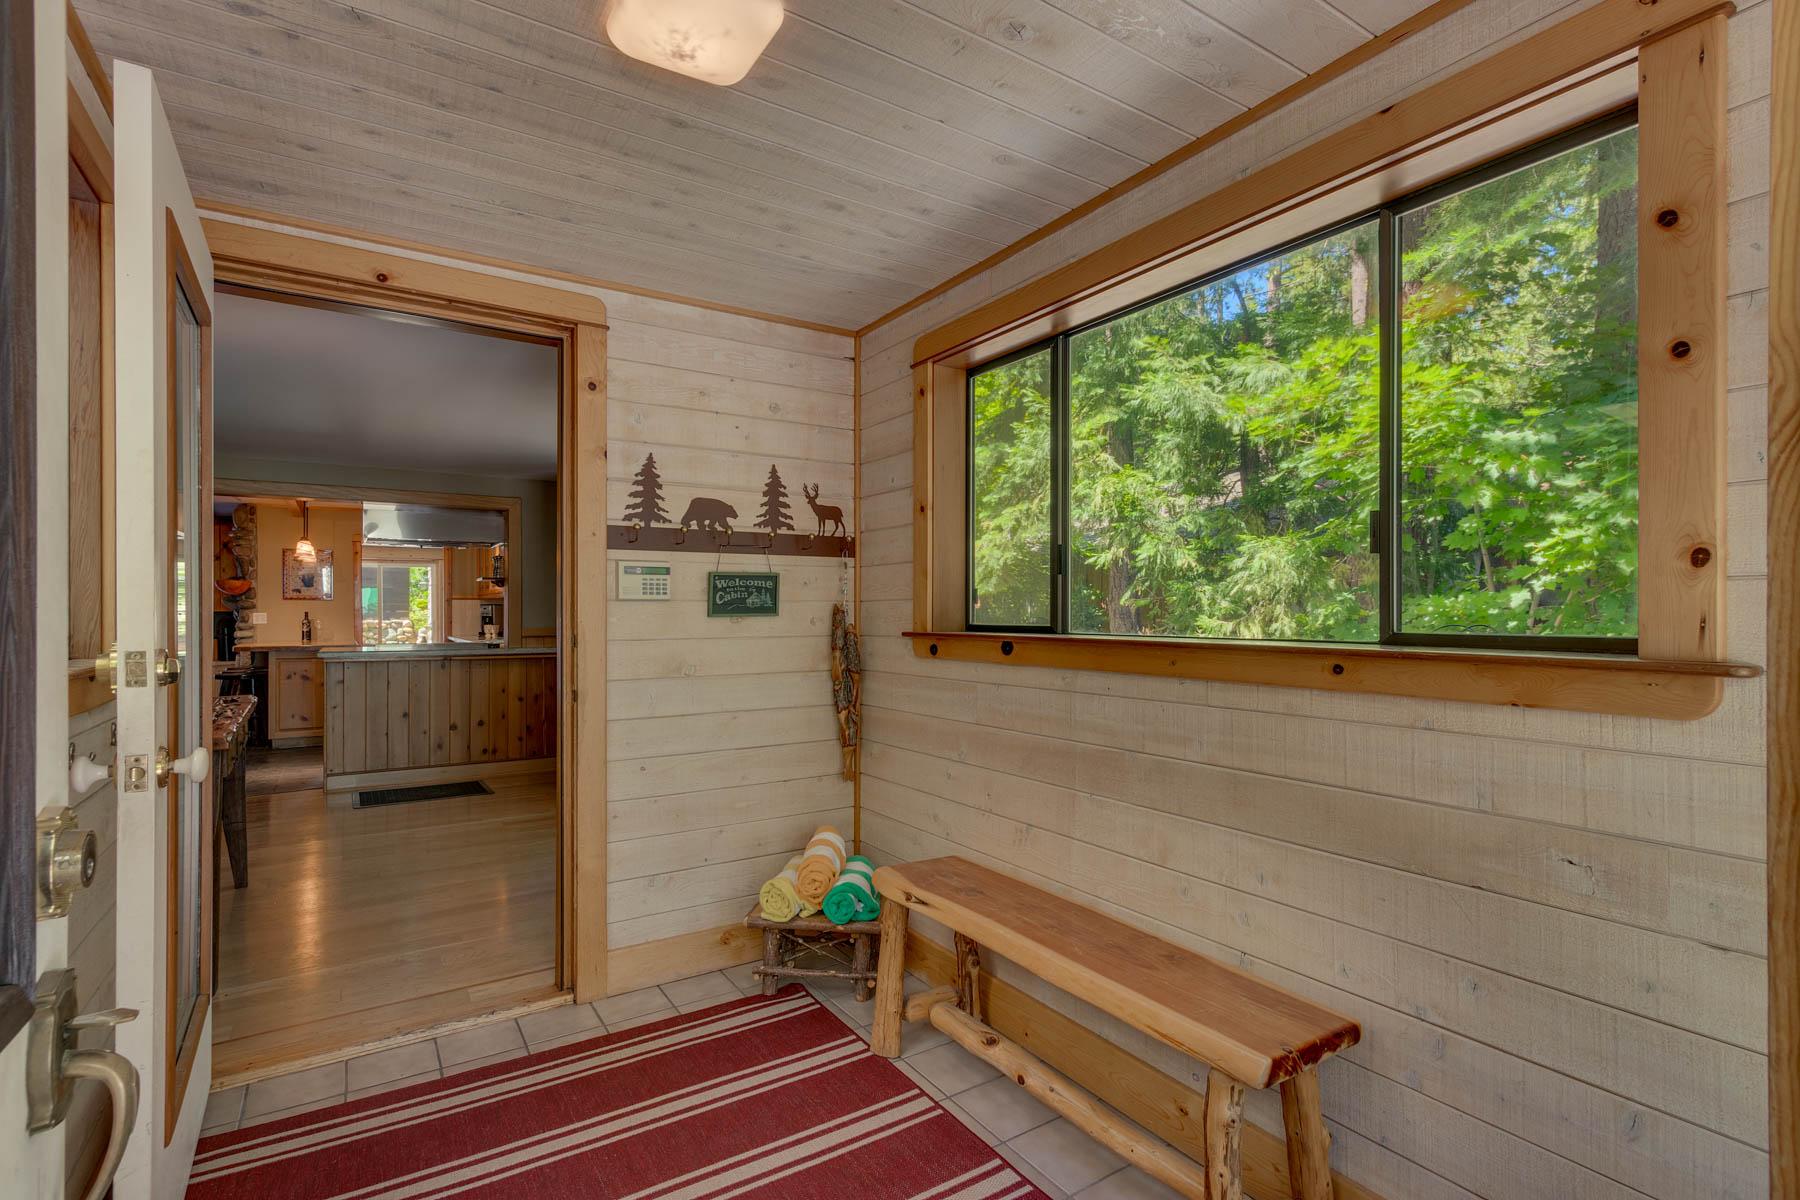 Additional photo for property listing at 1716 Willow Avenue, Tahoe City, CA 1716 Willow  Avenue Tahoe City, California 96145 Estados Unidos